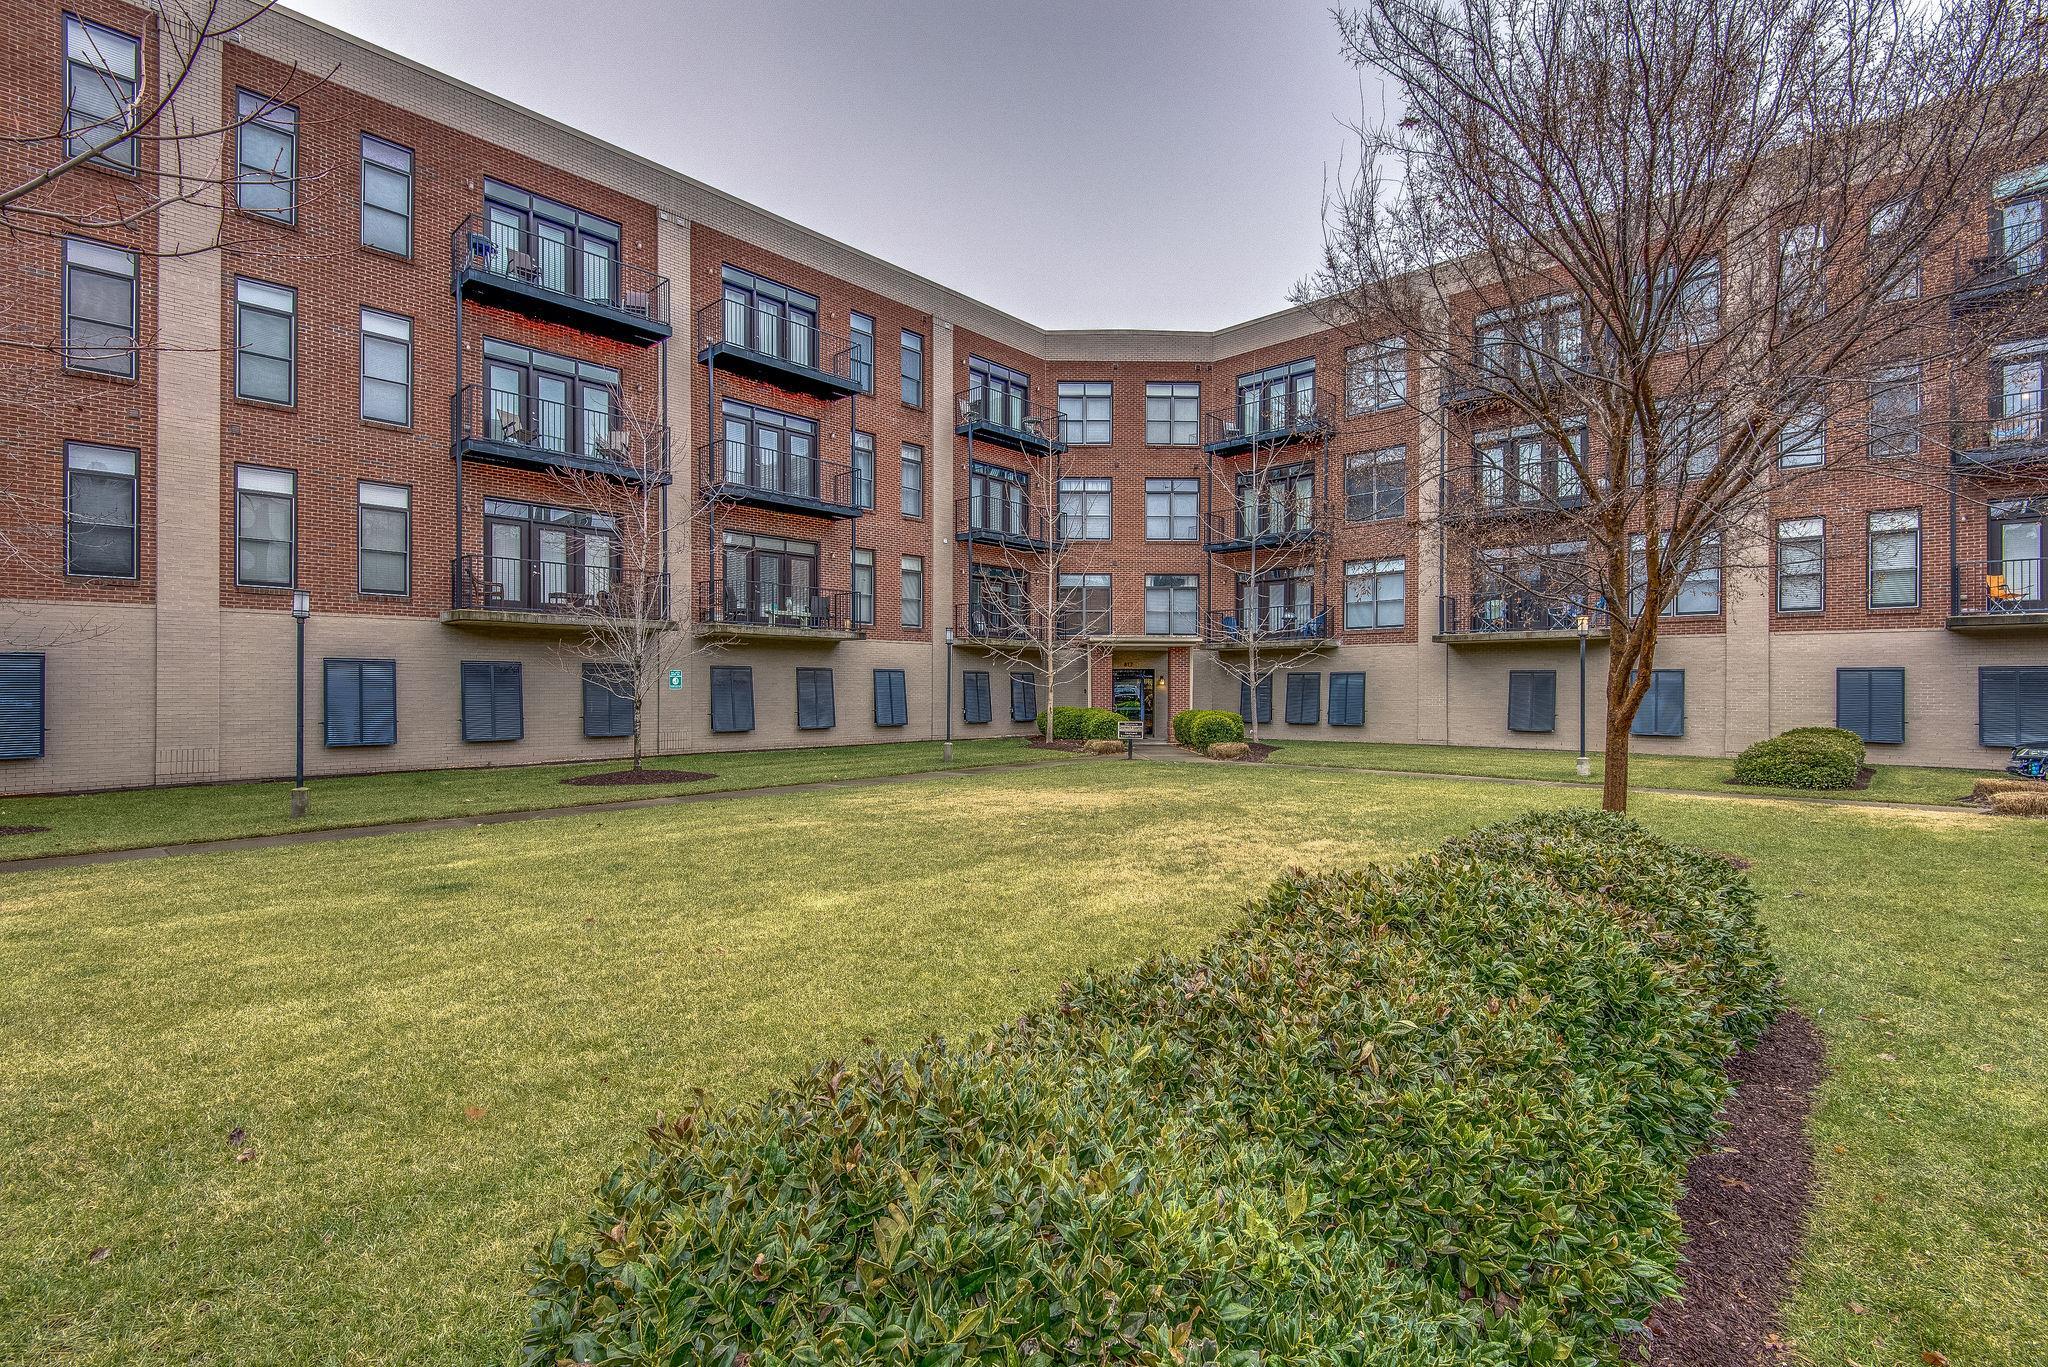 817 3rd Ave, N, Nashville, TN 37201 - Nashville, TN real estate listing